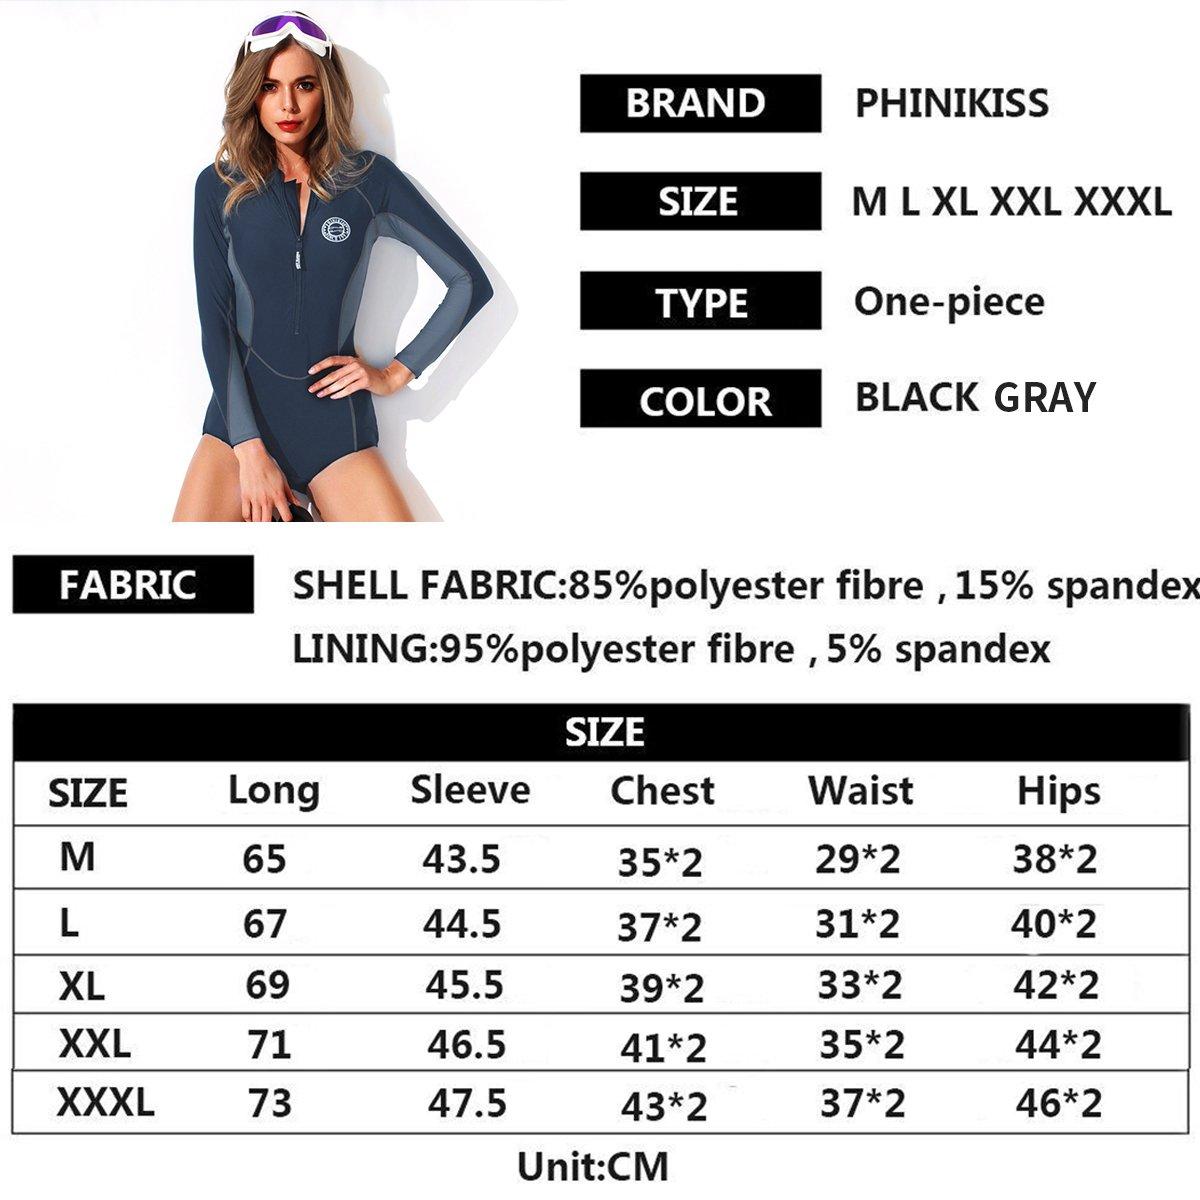 5cde0bc8b5f0f Bikini FOCLASSY Damen Sport BIKINI Badeanzug One Piece Long Sleeves ...